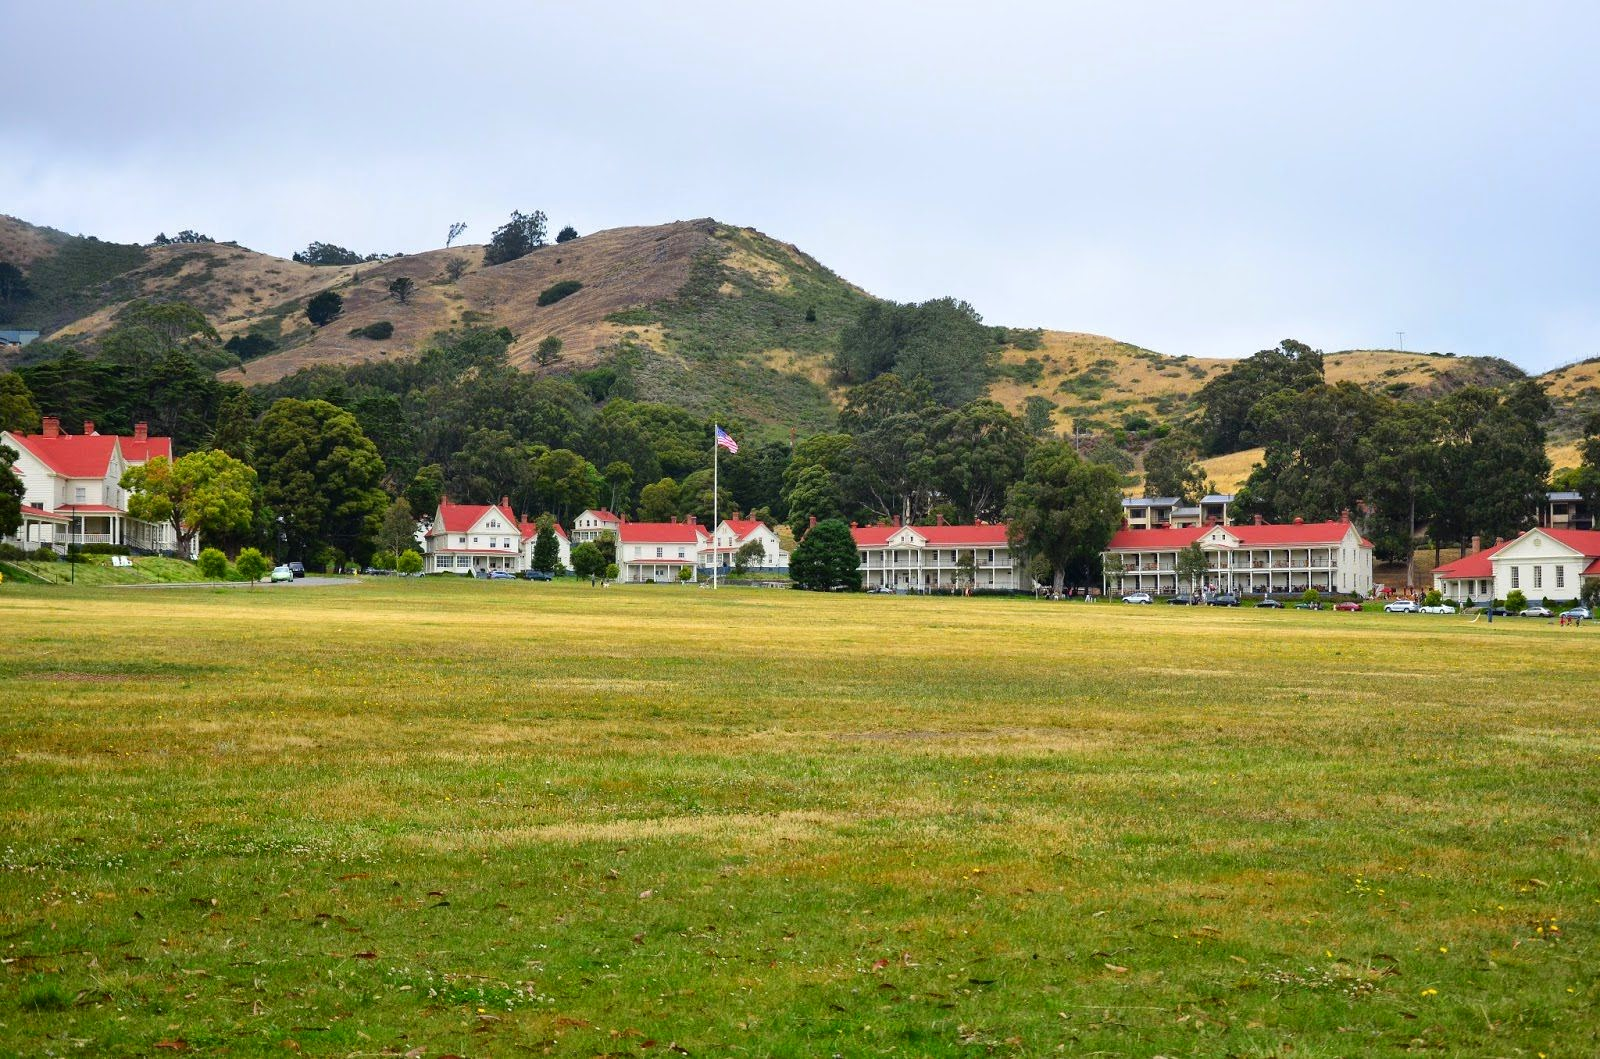 Cavallo Point The Lodge at the Golden Gate, Sausalito, California